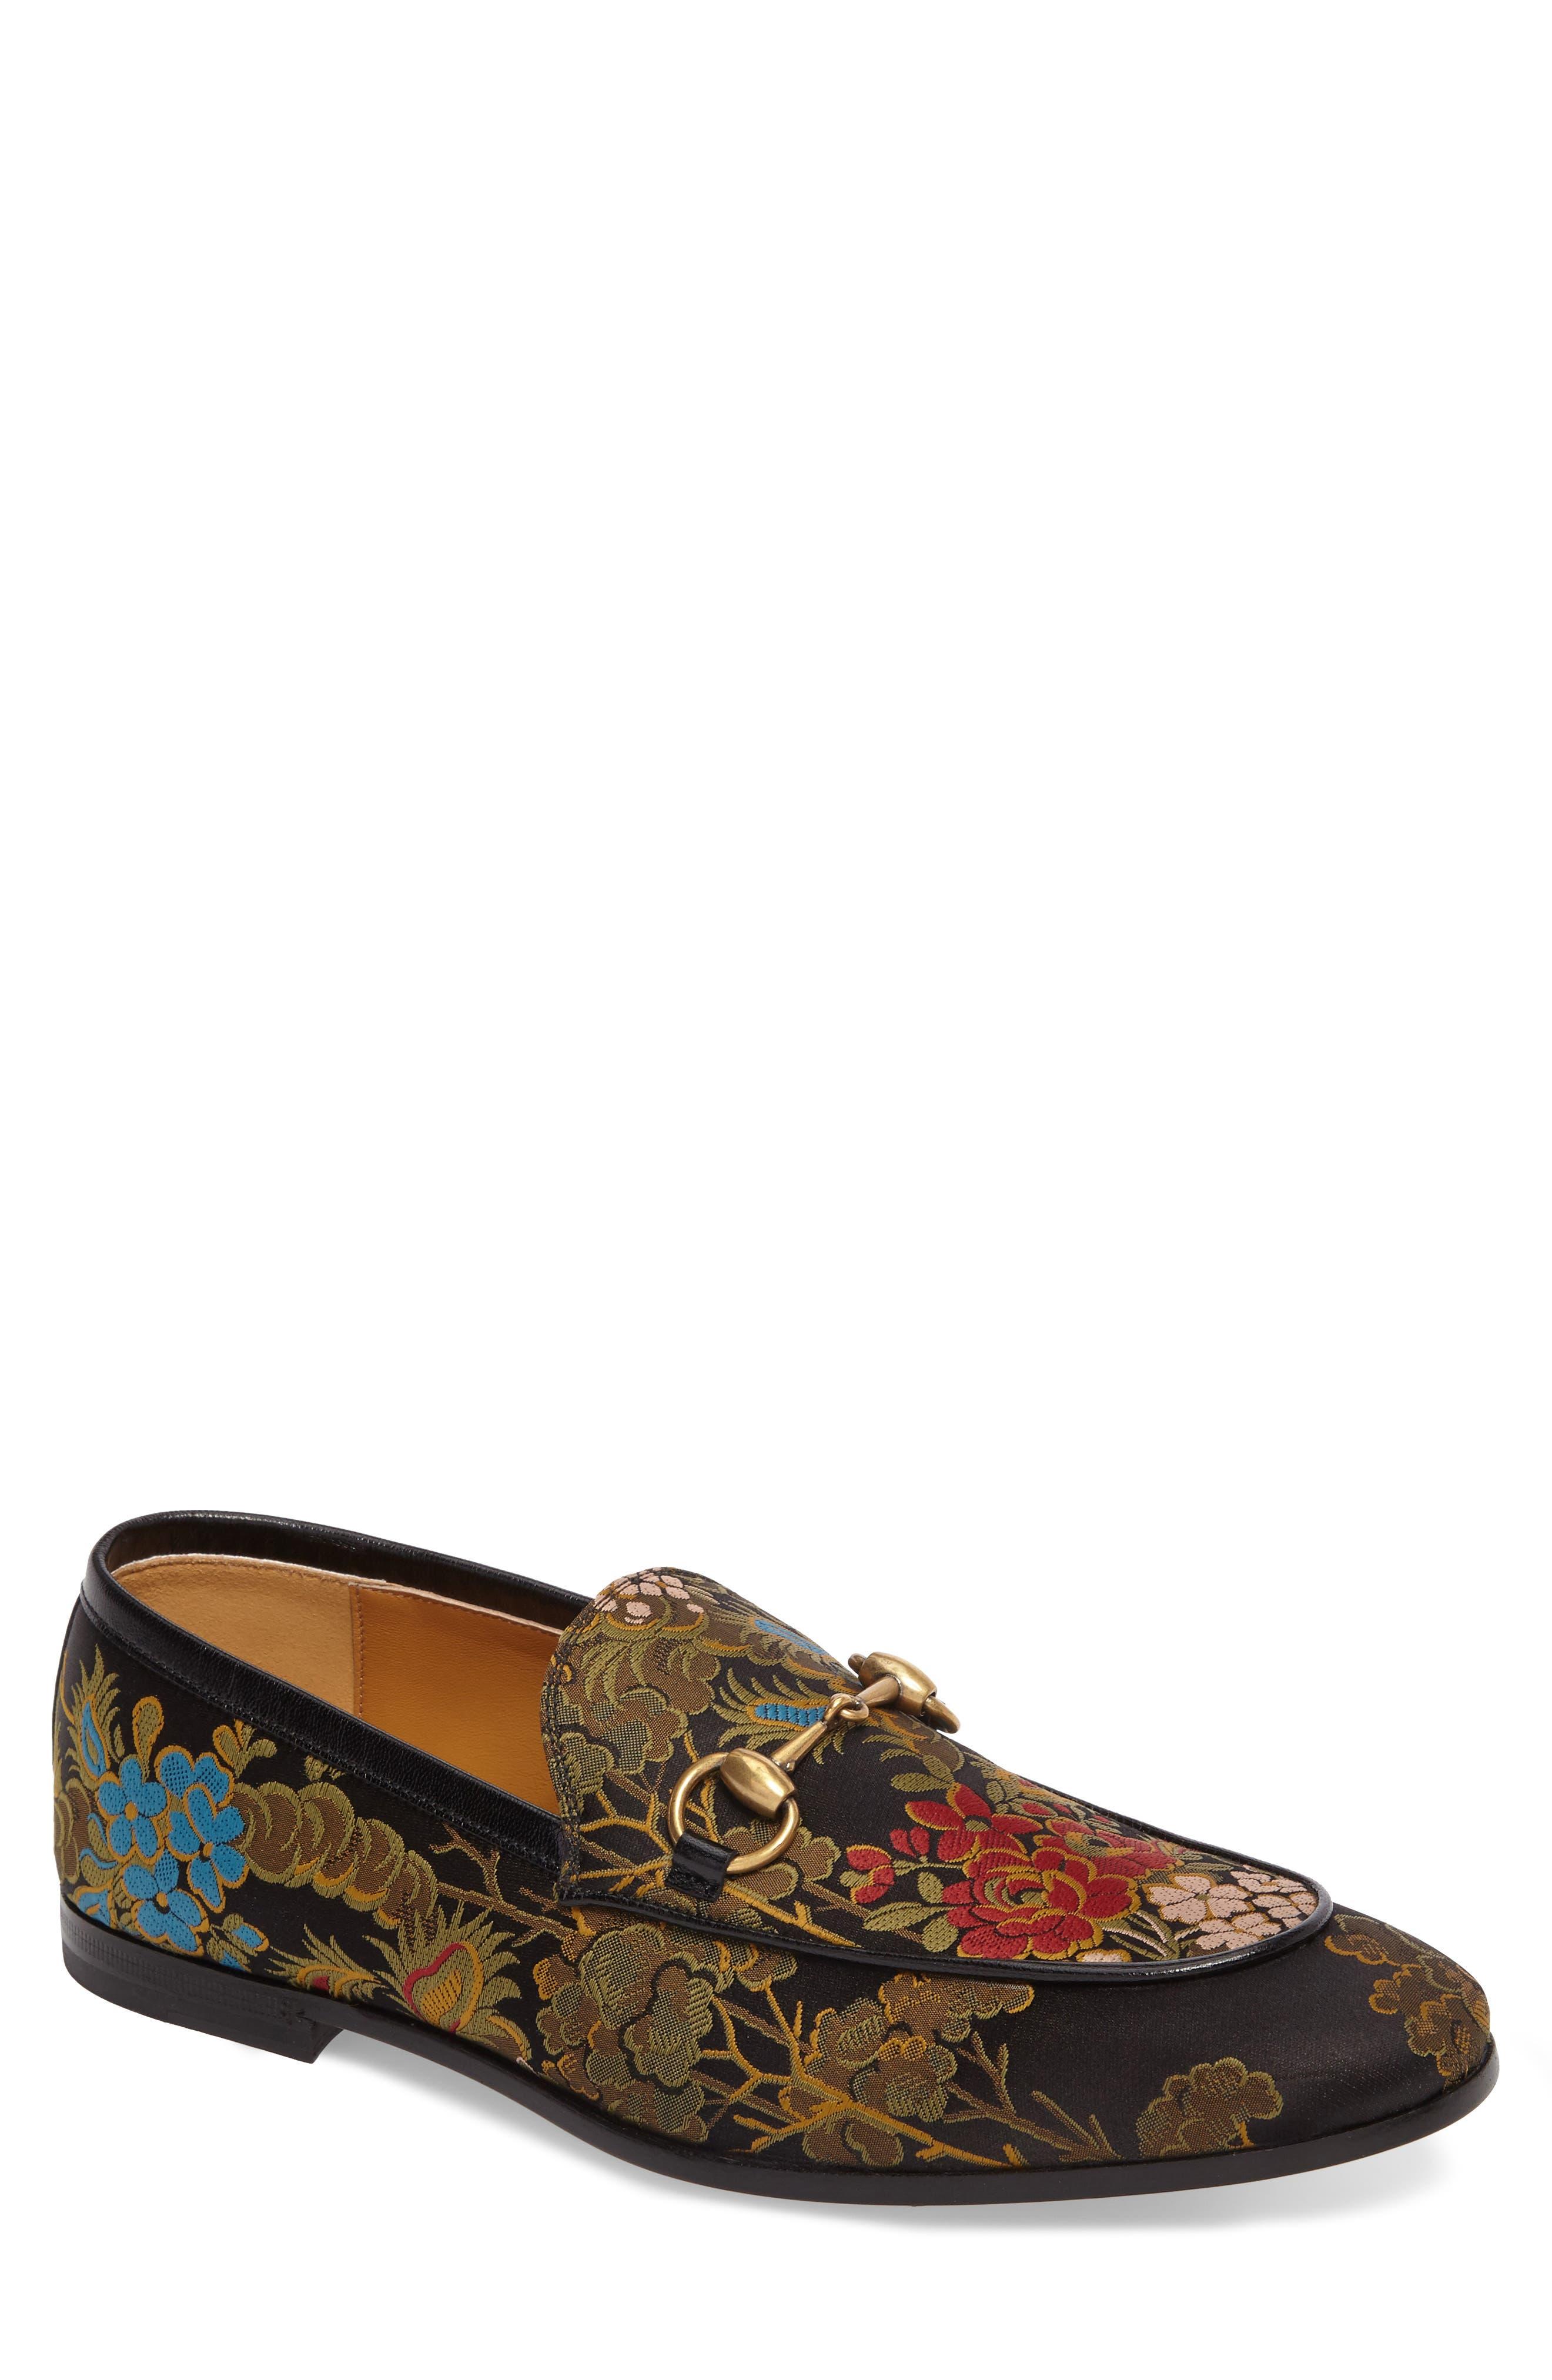 Gucci Jordaan Jacquard Bit Loafer (Men)